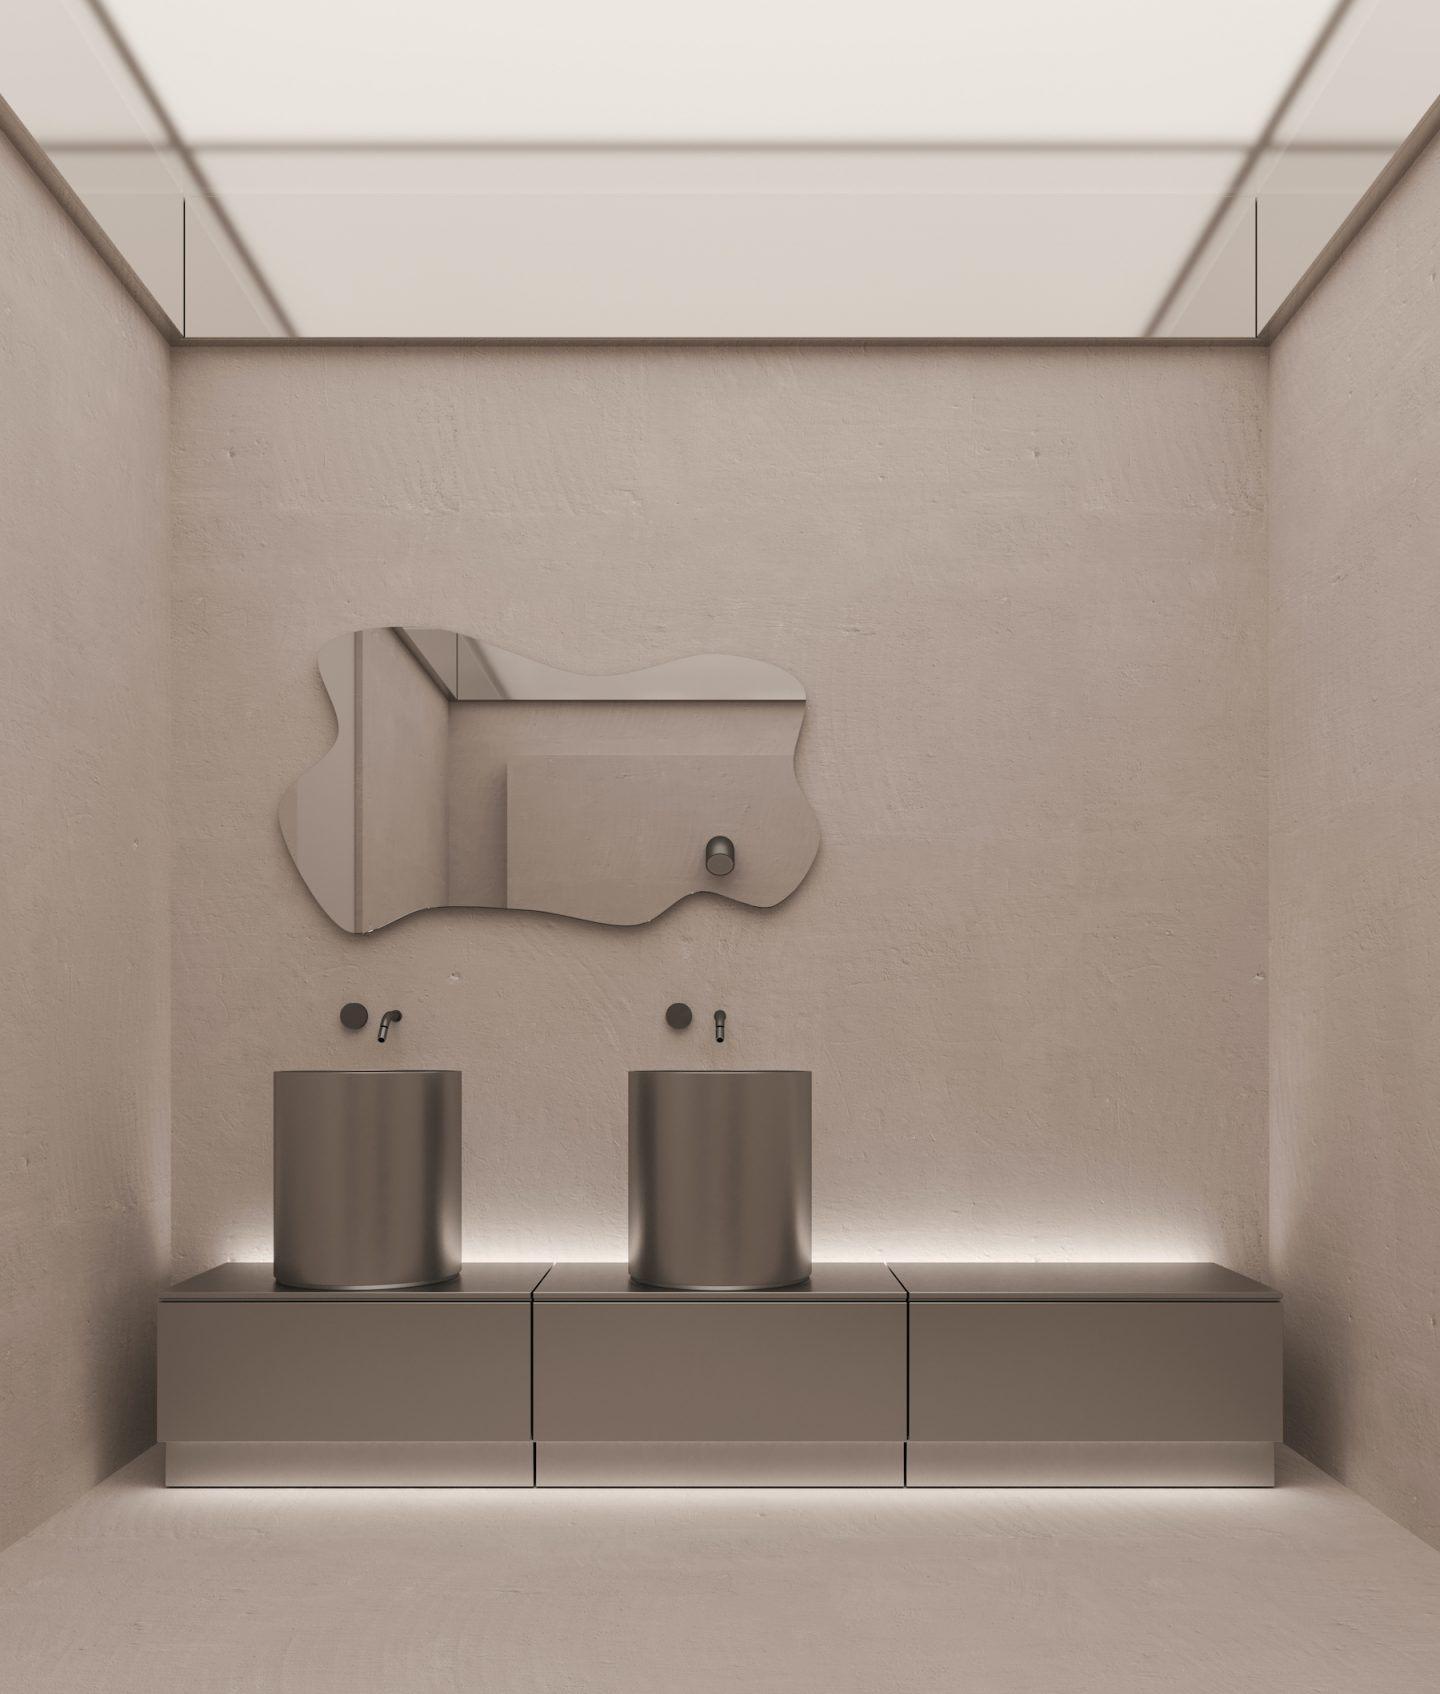 IGNANT-Design-Kanstantsin-Remez-II-Introvert-Residence-018